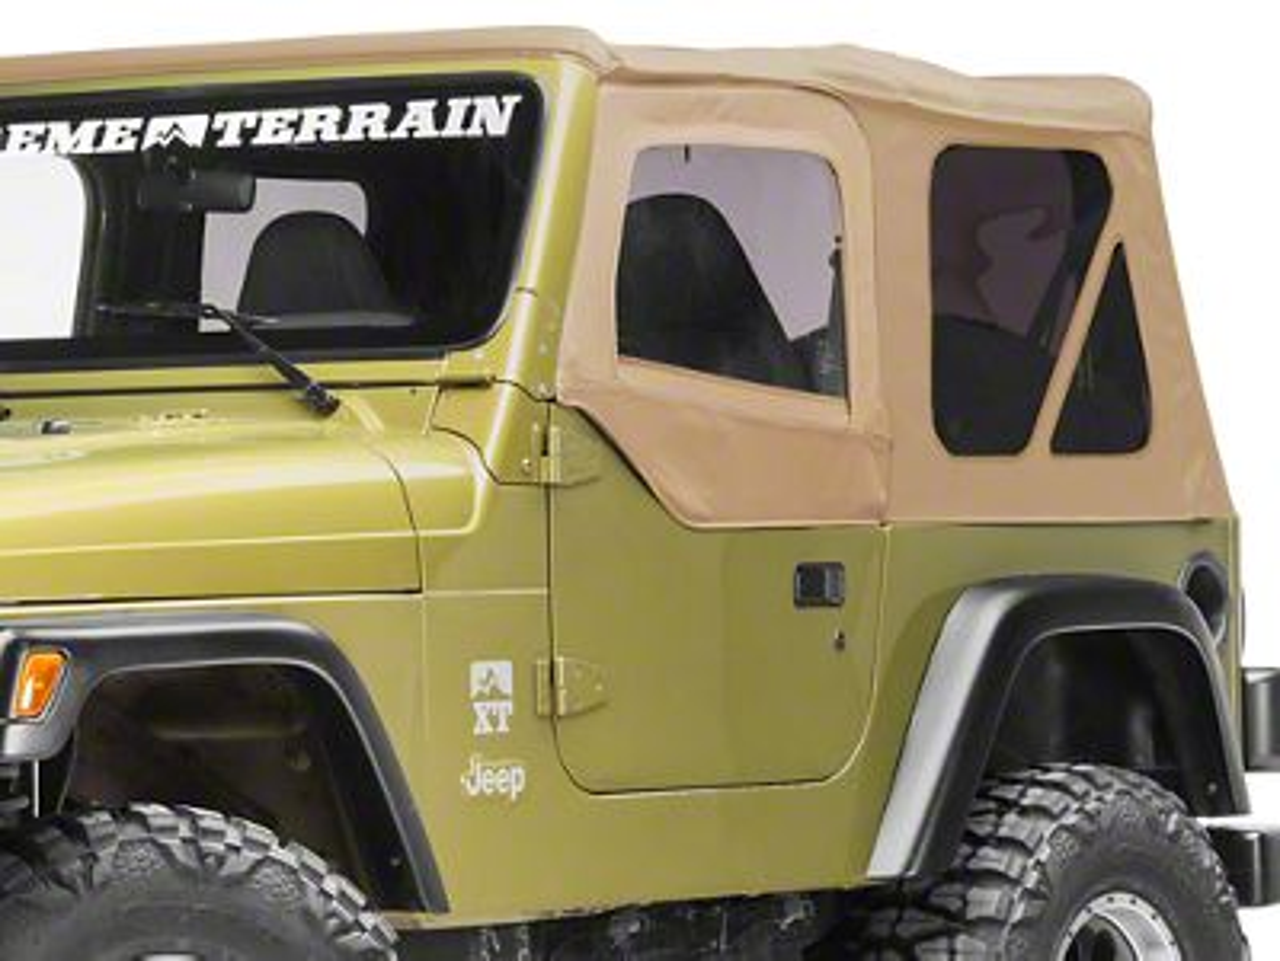 Smittybilt Soft Top Door Skin w/ Frame & Clear Windows - Driver Side - Spice Denim (97-06 Jeep Wrangler TJ)